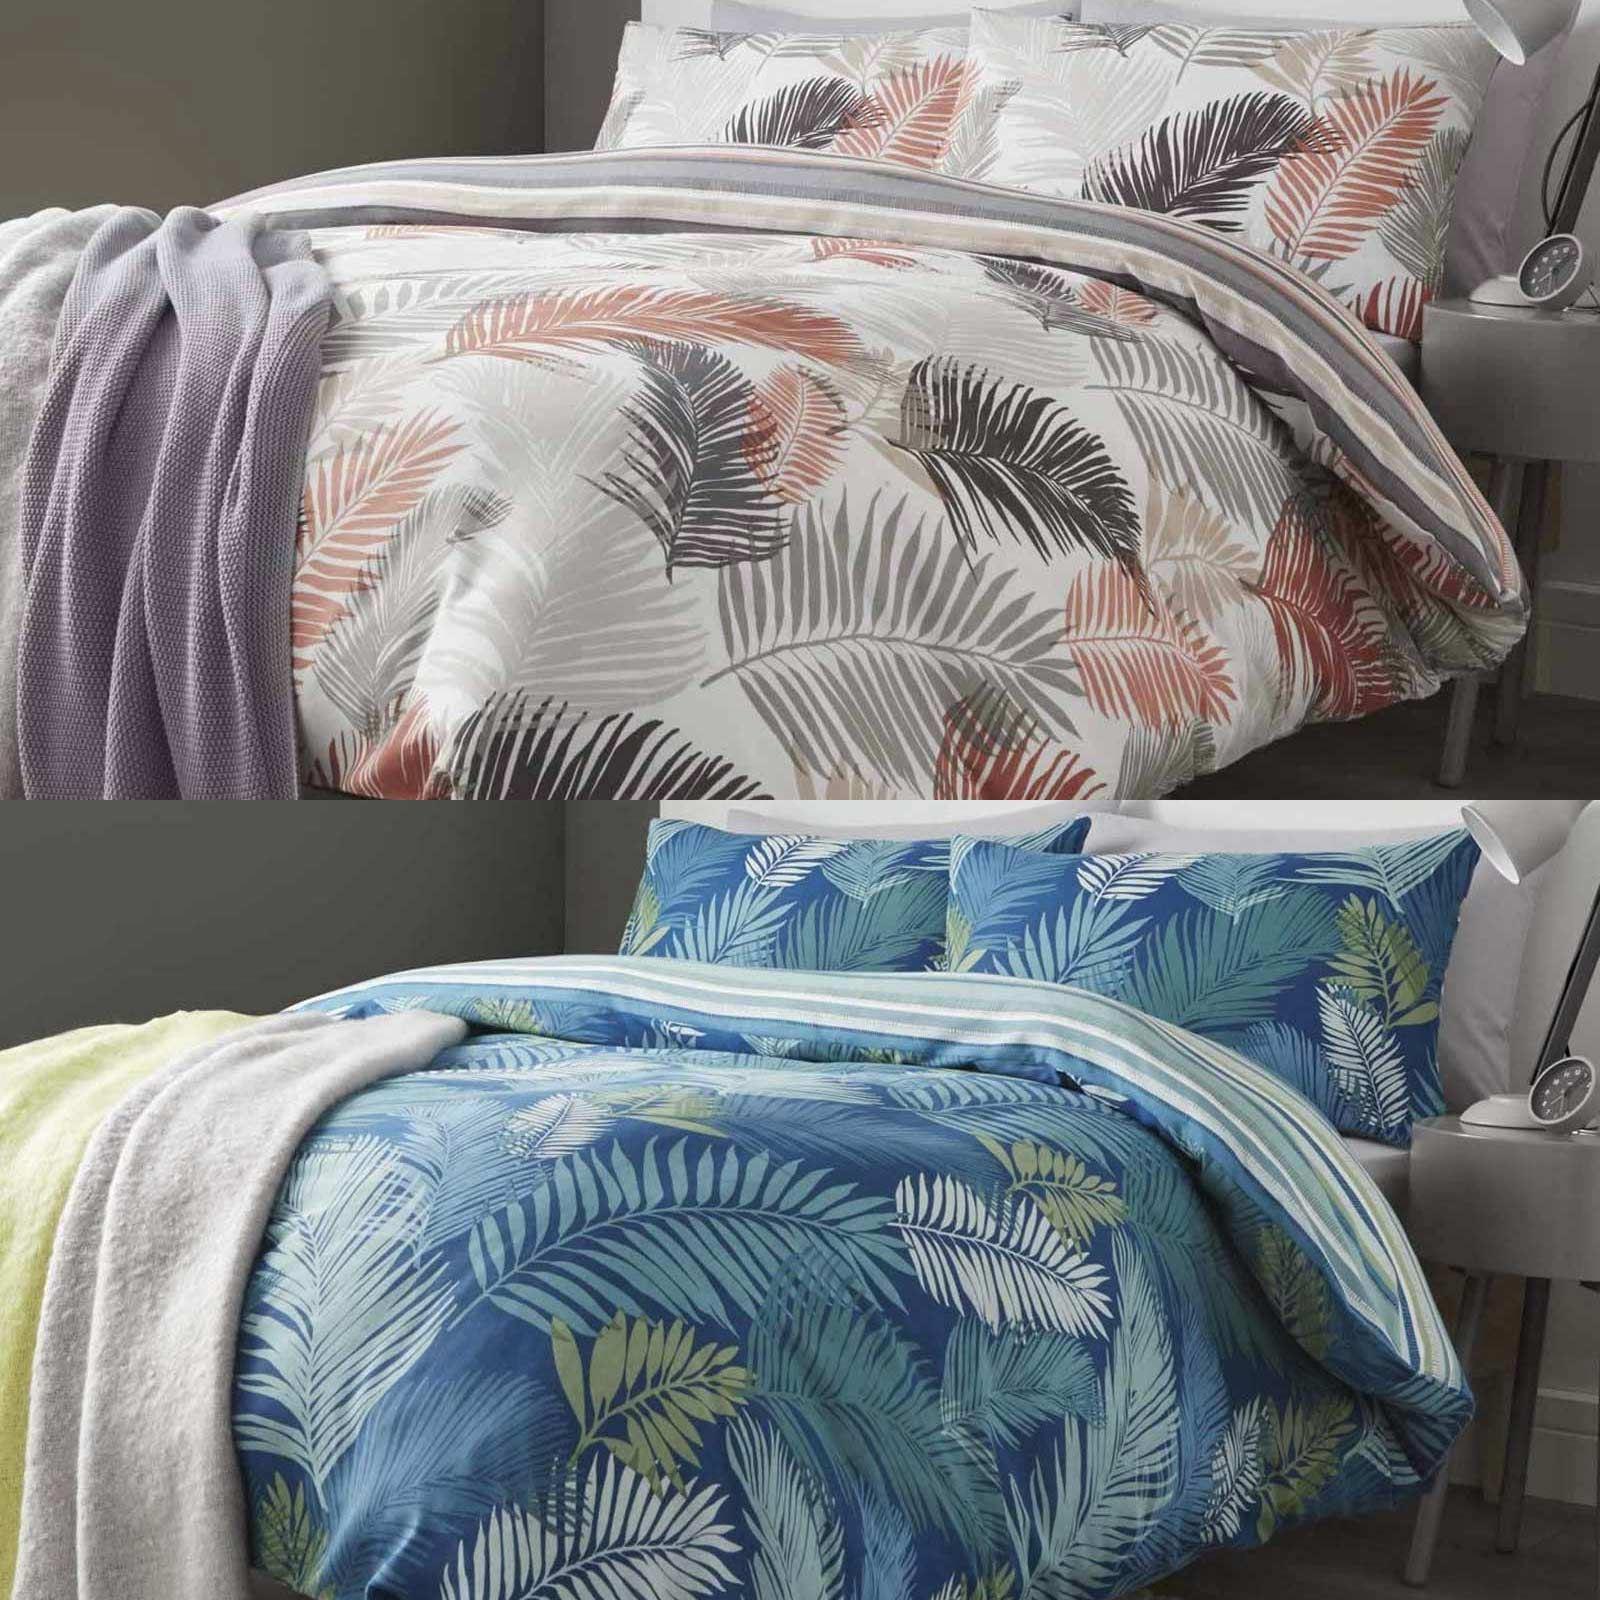 Tropical duvet covers modern palm leaf jungle cotton